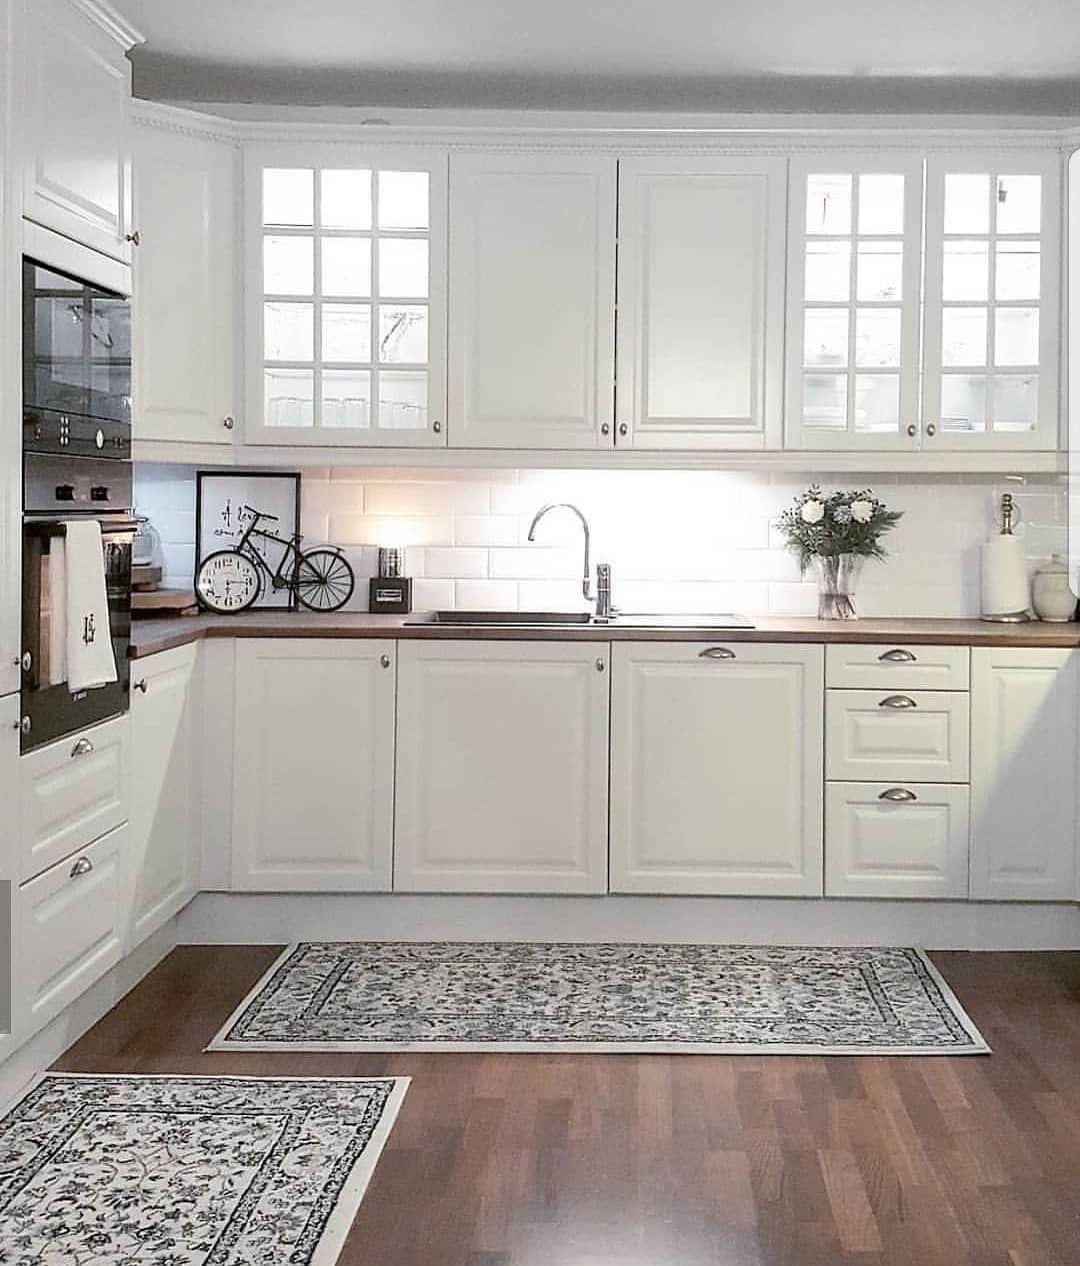 ديكور تنسيقات اثاث On Instagram ديكورات ديكور ديكورات داخليه تنسيقات اف Kitchen Cabinet Design Kitchen Design Open Living Room Decor Apartment